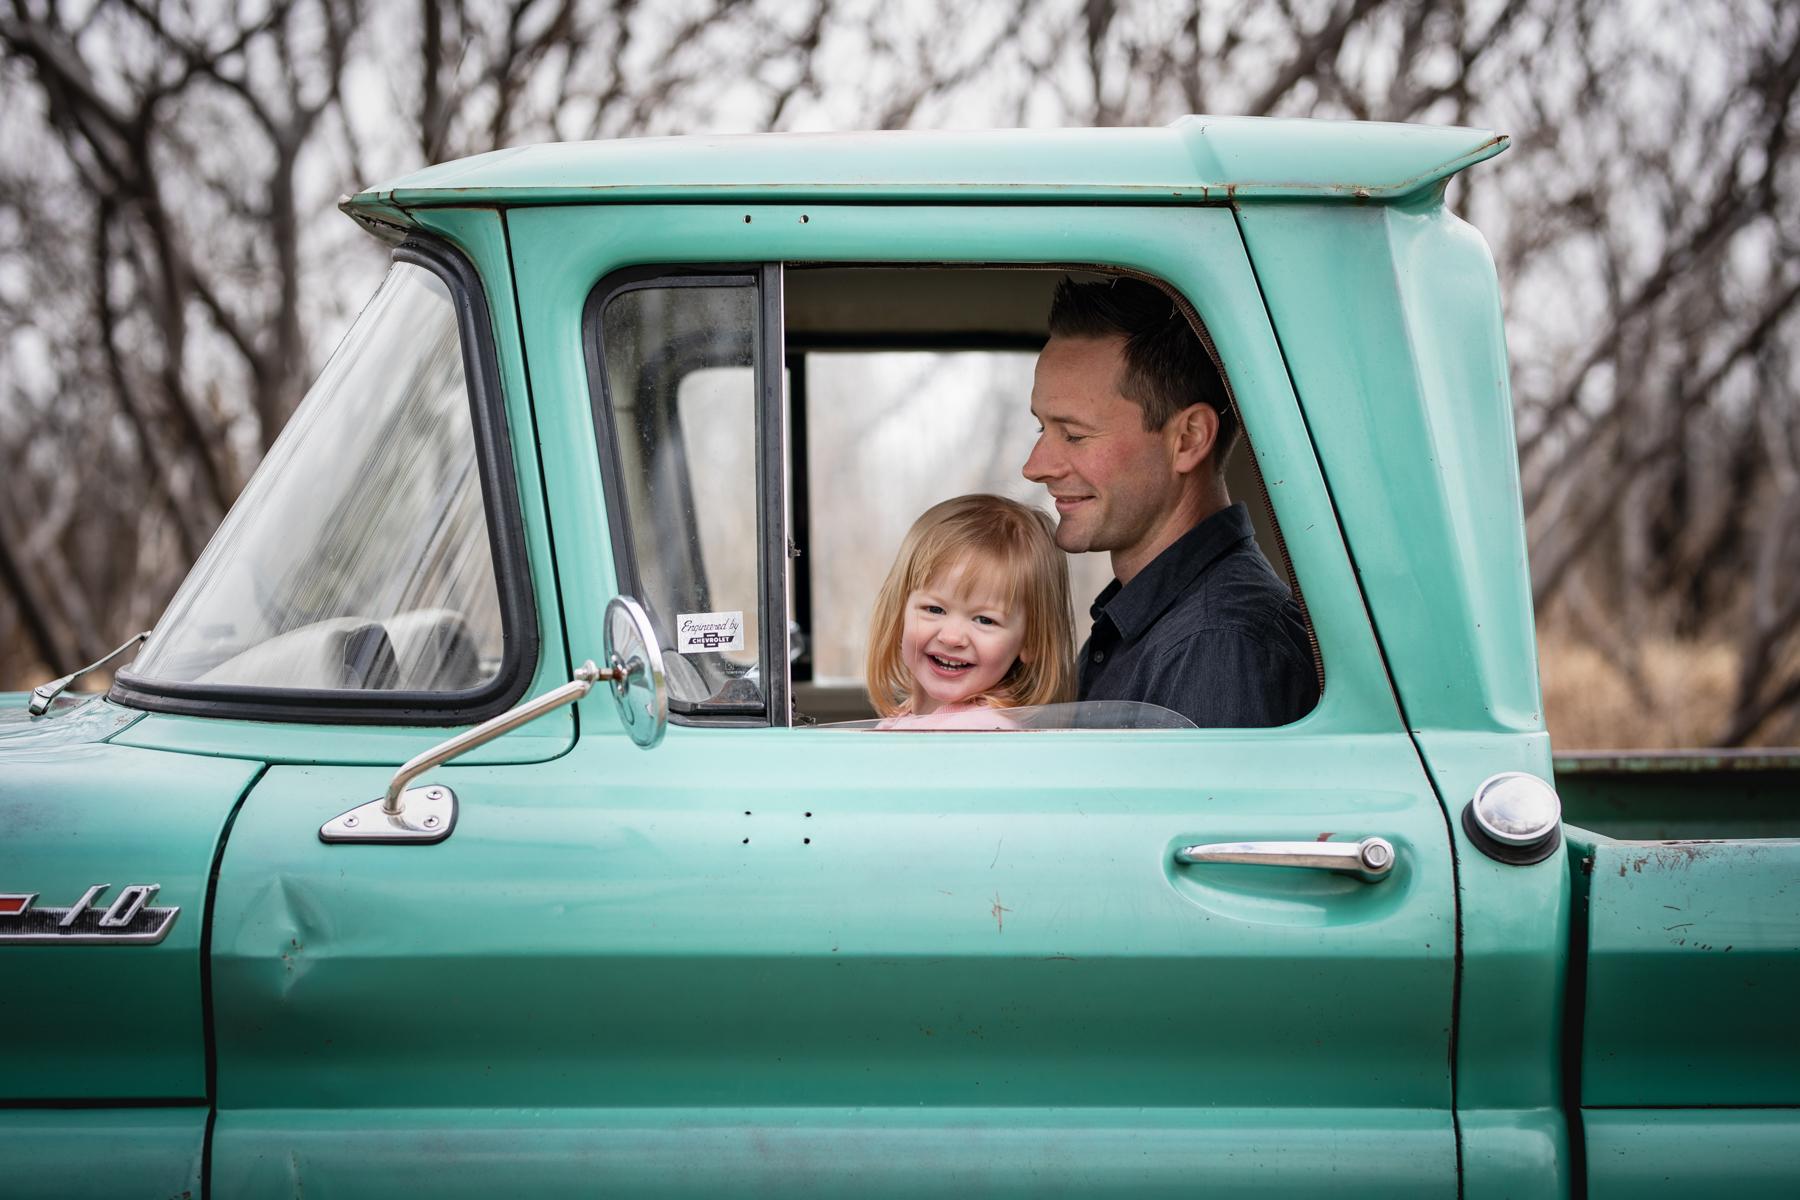 Family-Chevy-Truck-Blue-Jodie-Aldred-Photography-Middlesex-london-Dutton-glencoe-ontario-chatham-huron-lambton-elgin.jpg